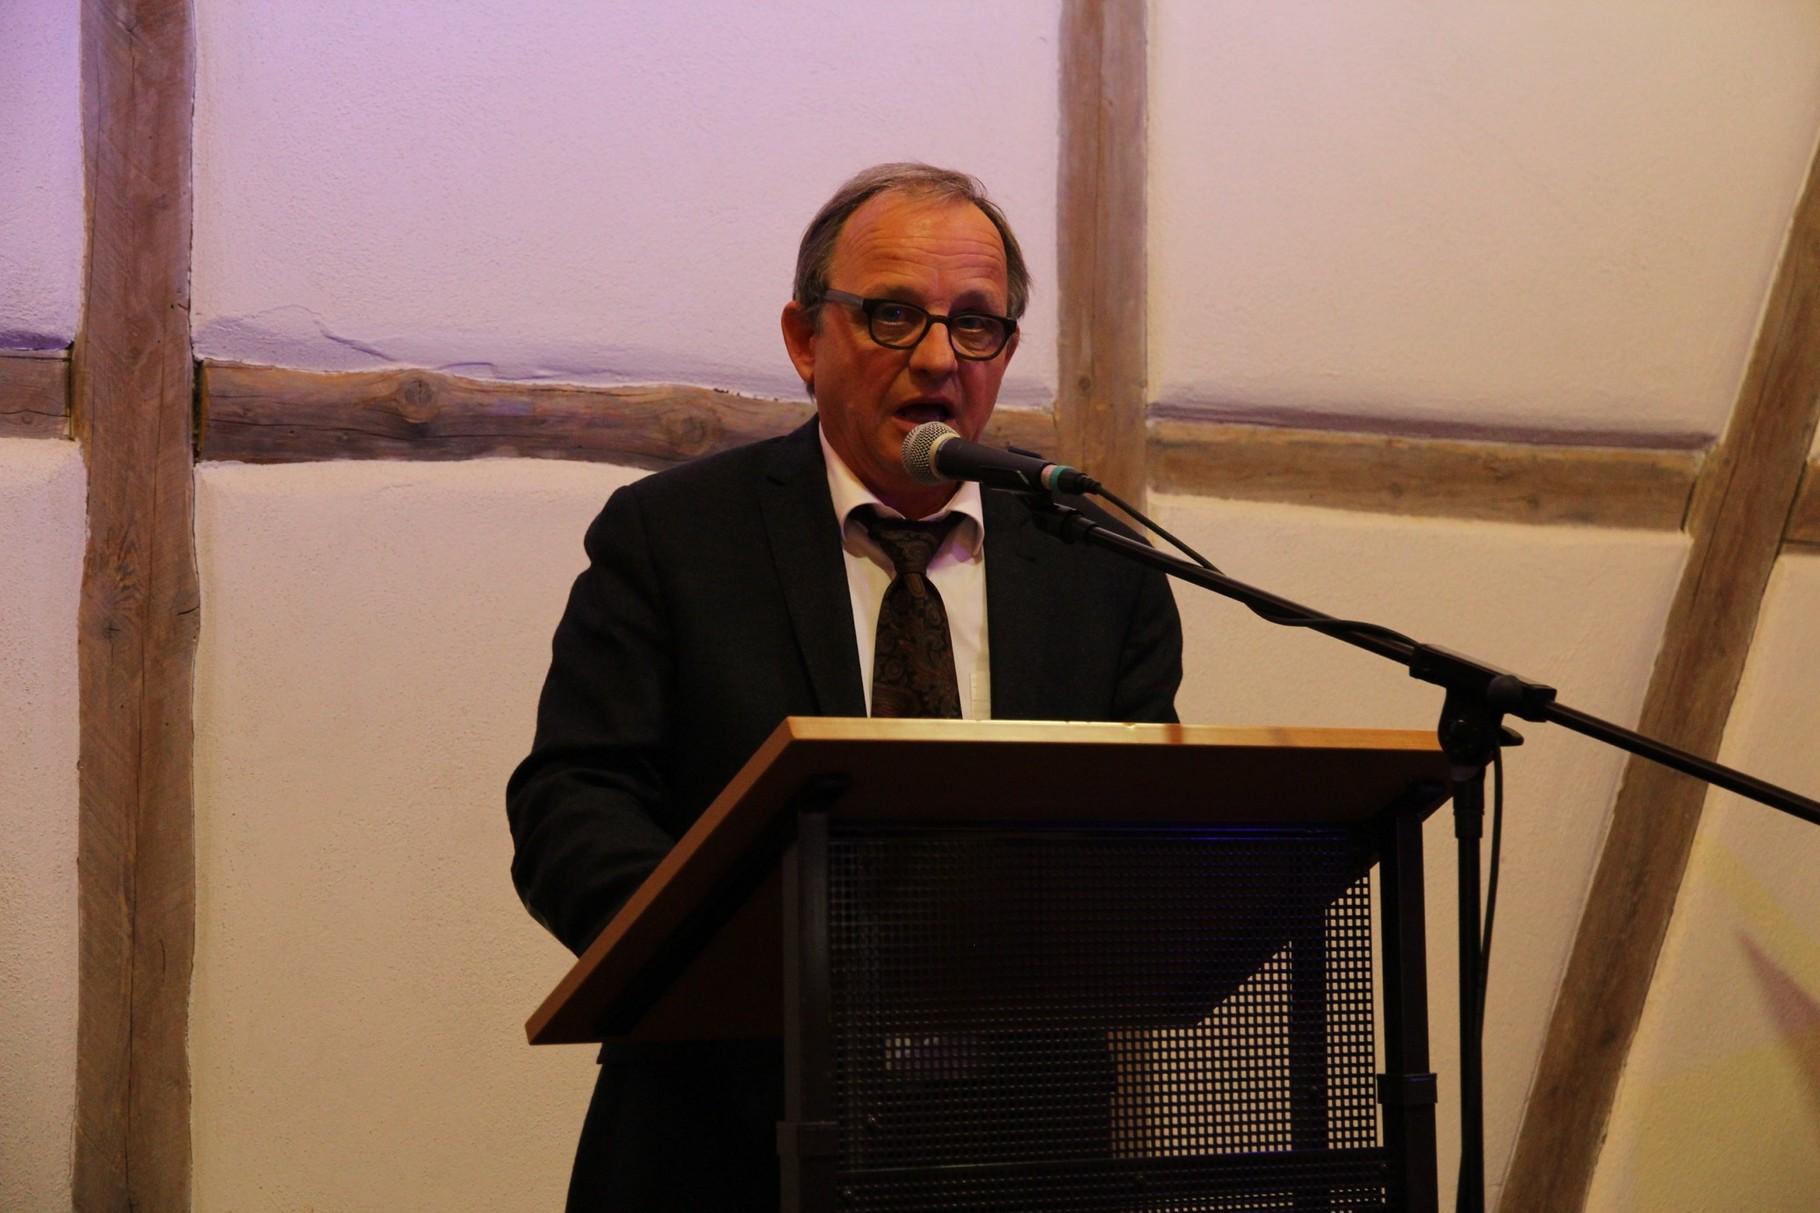 Erzb. Bauoberamtsrat Hanno Roters erläutert das Renovierungsprojekt